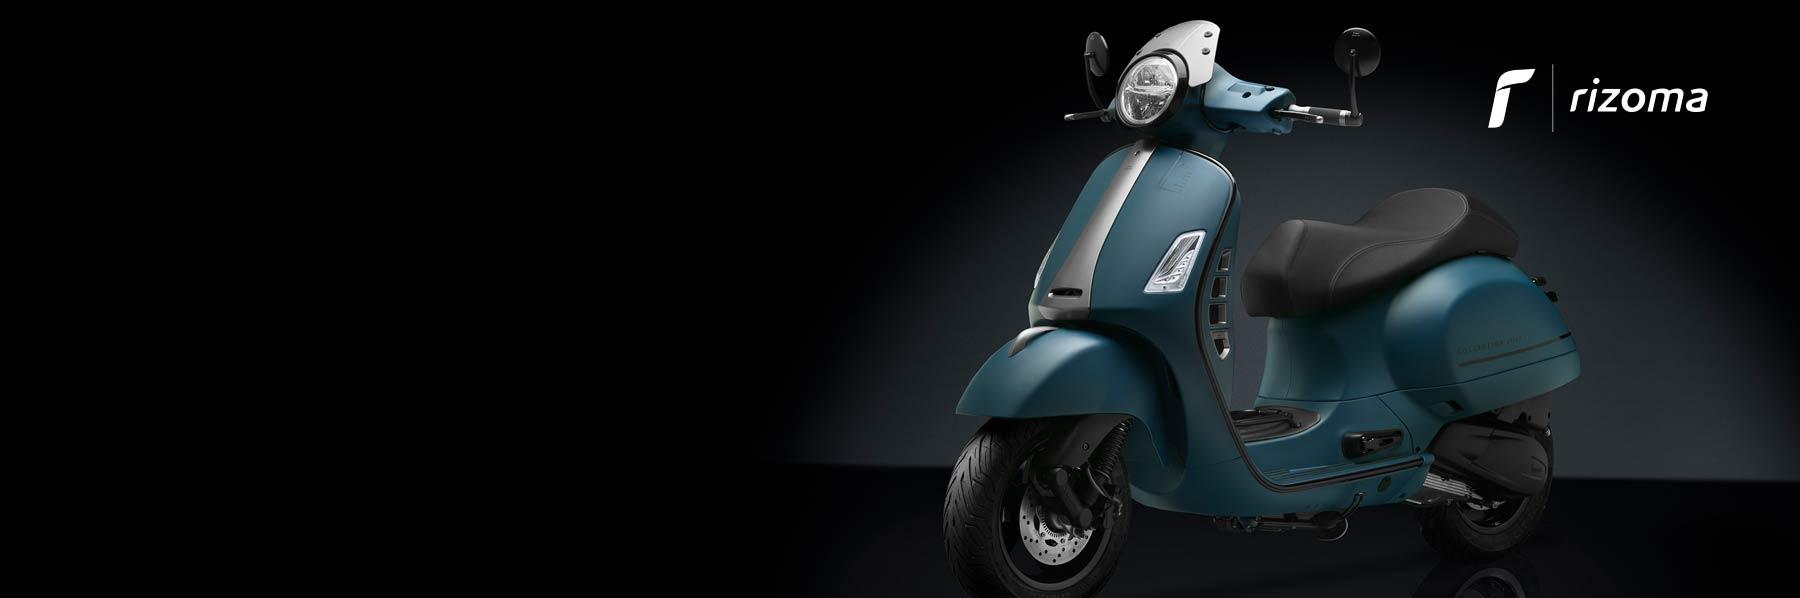 Vespa tuning & scooter parts | SIP-Scootershop